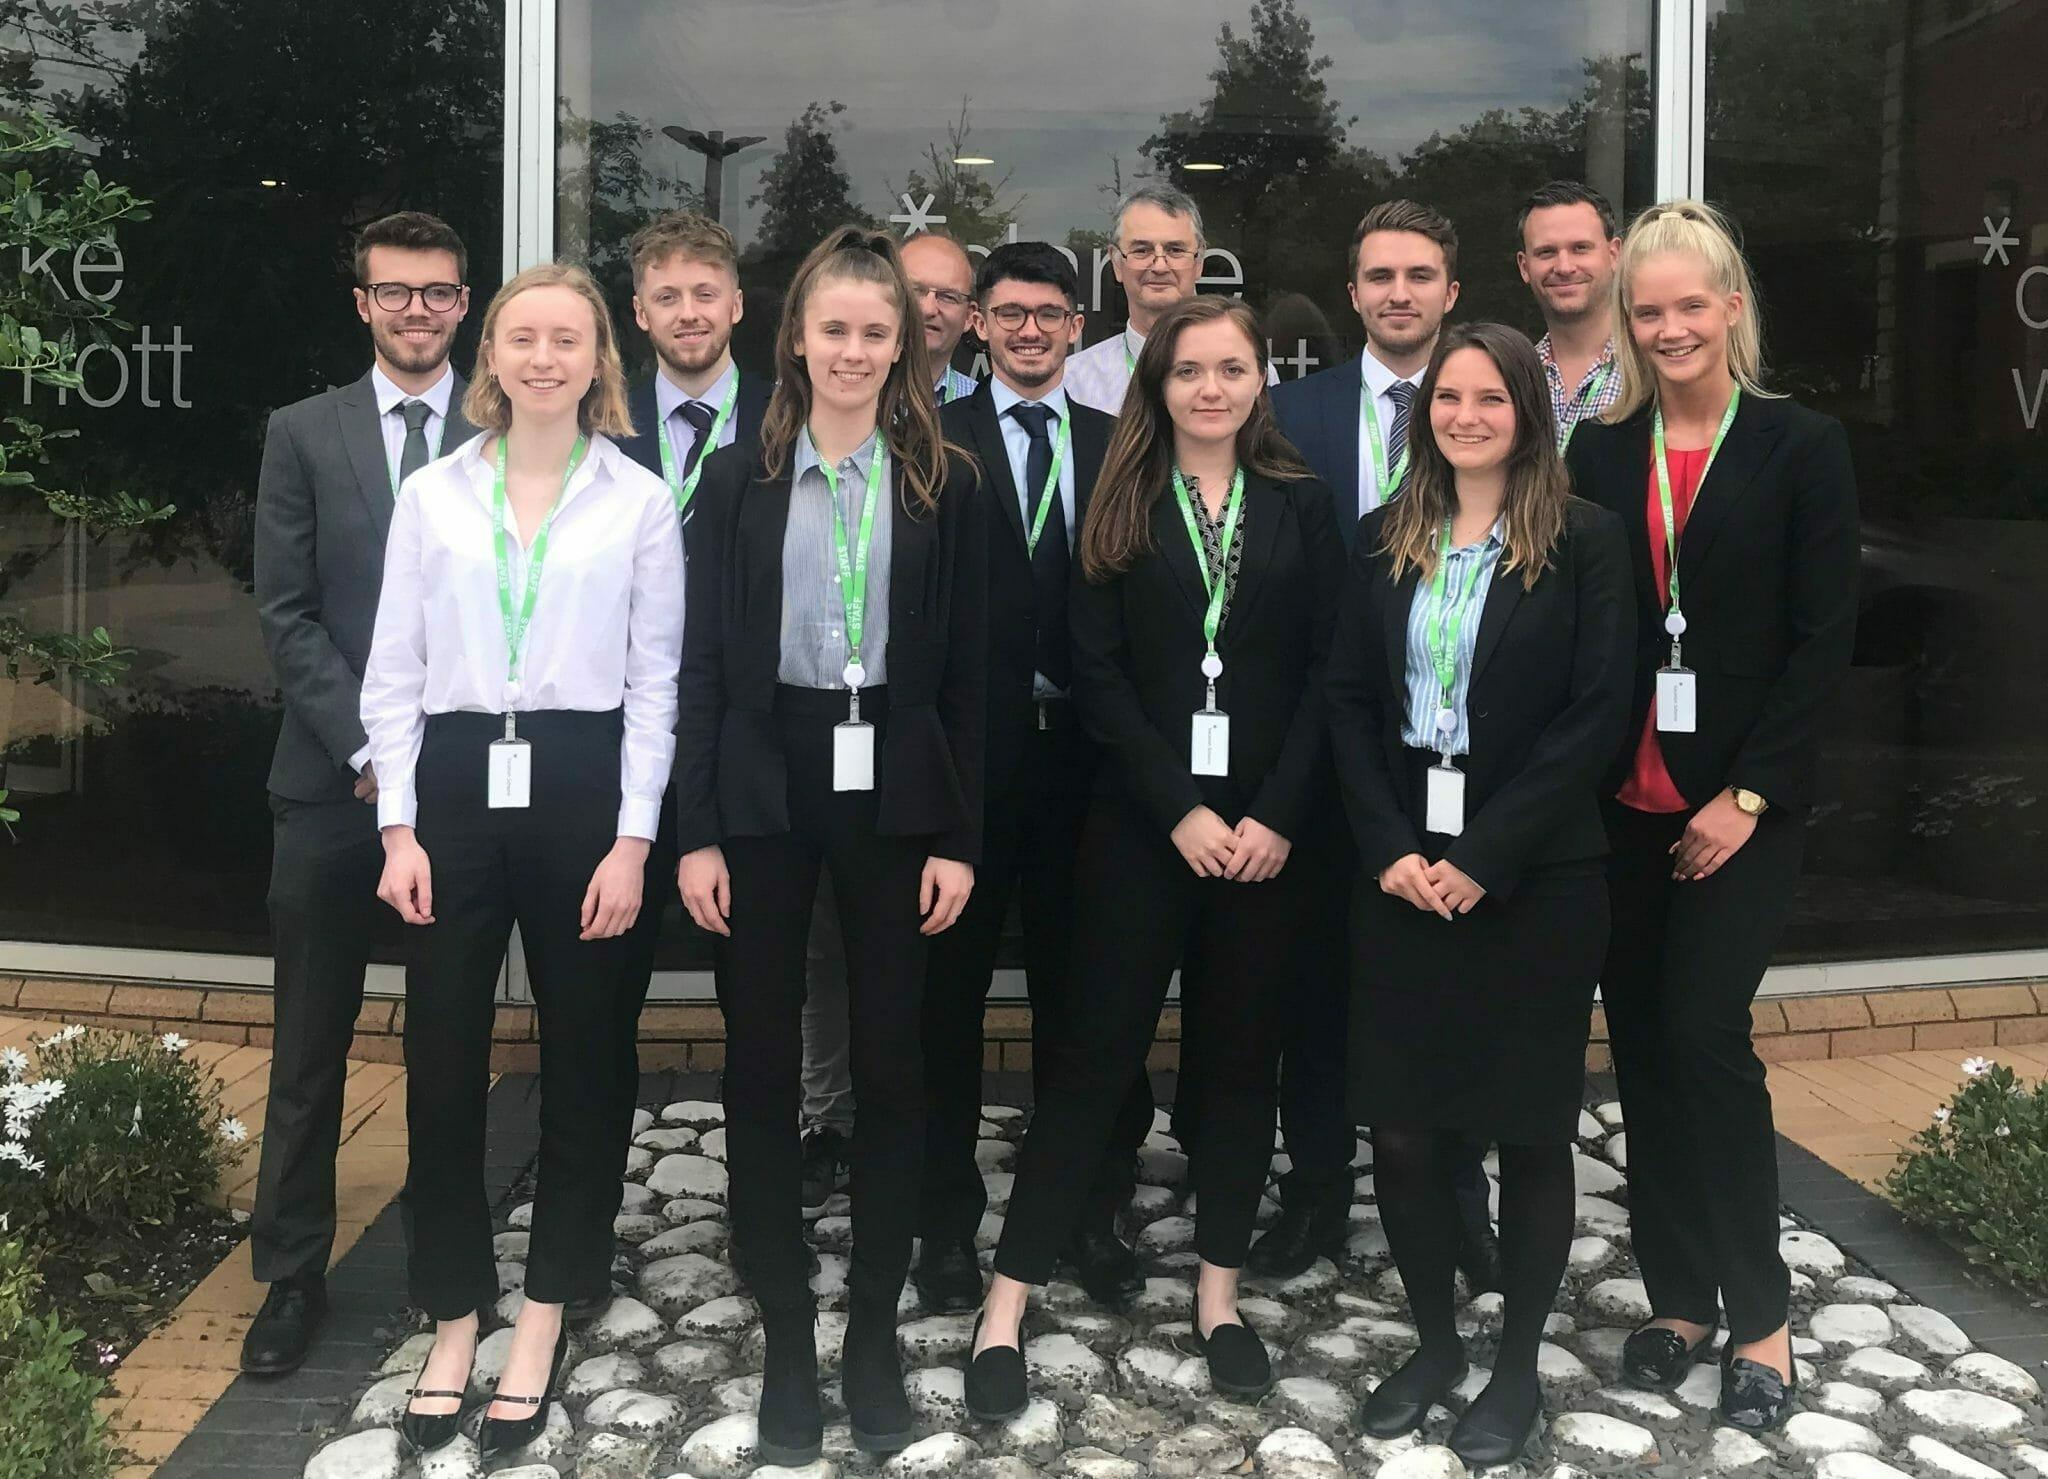 Taunton summer scheme 2019 participants